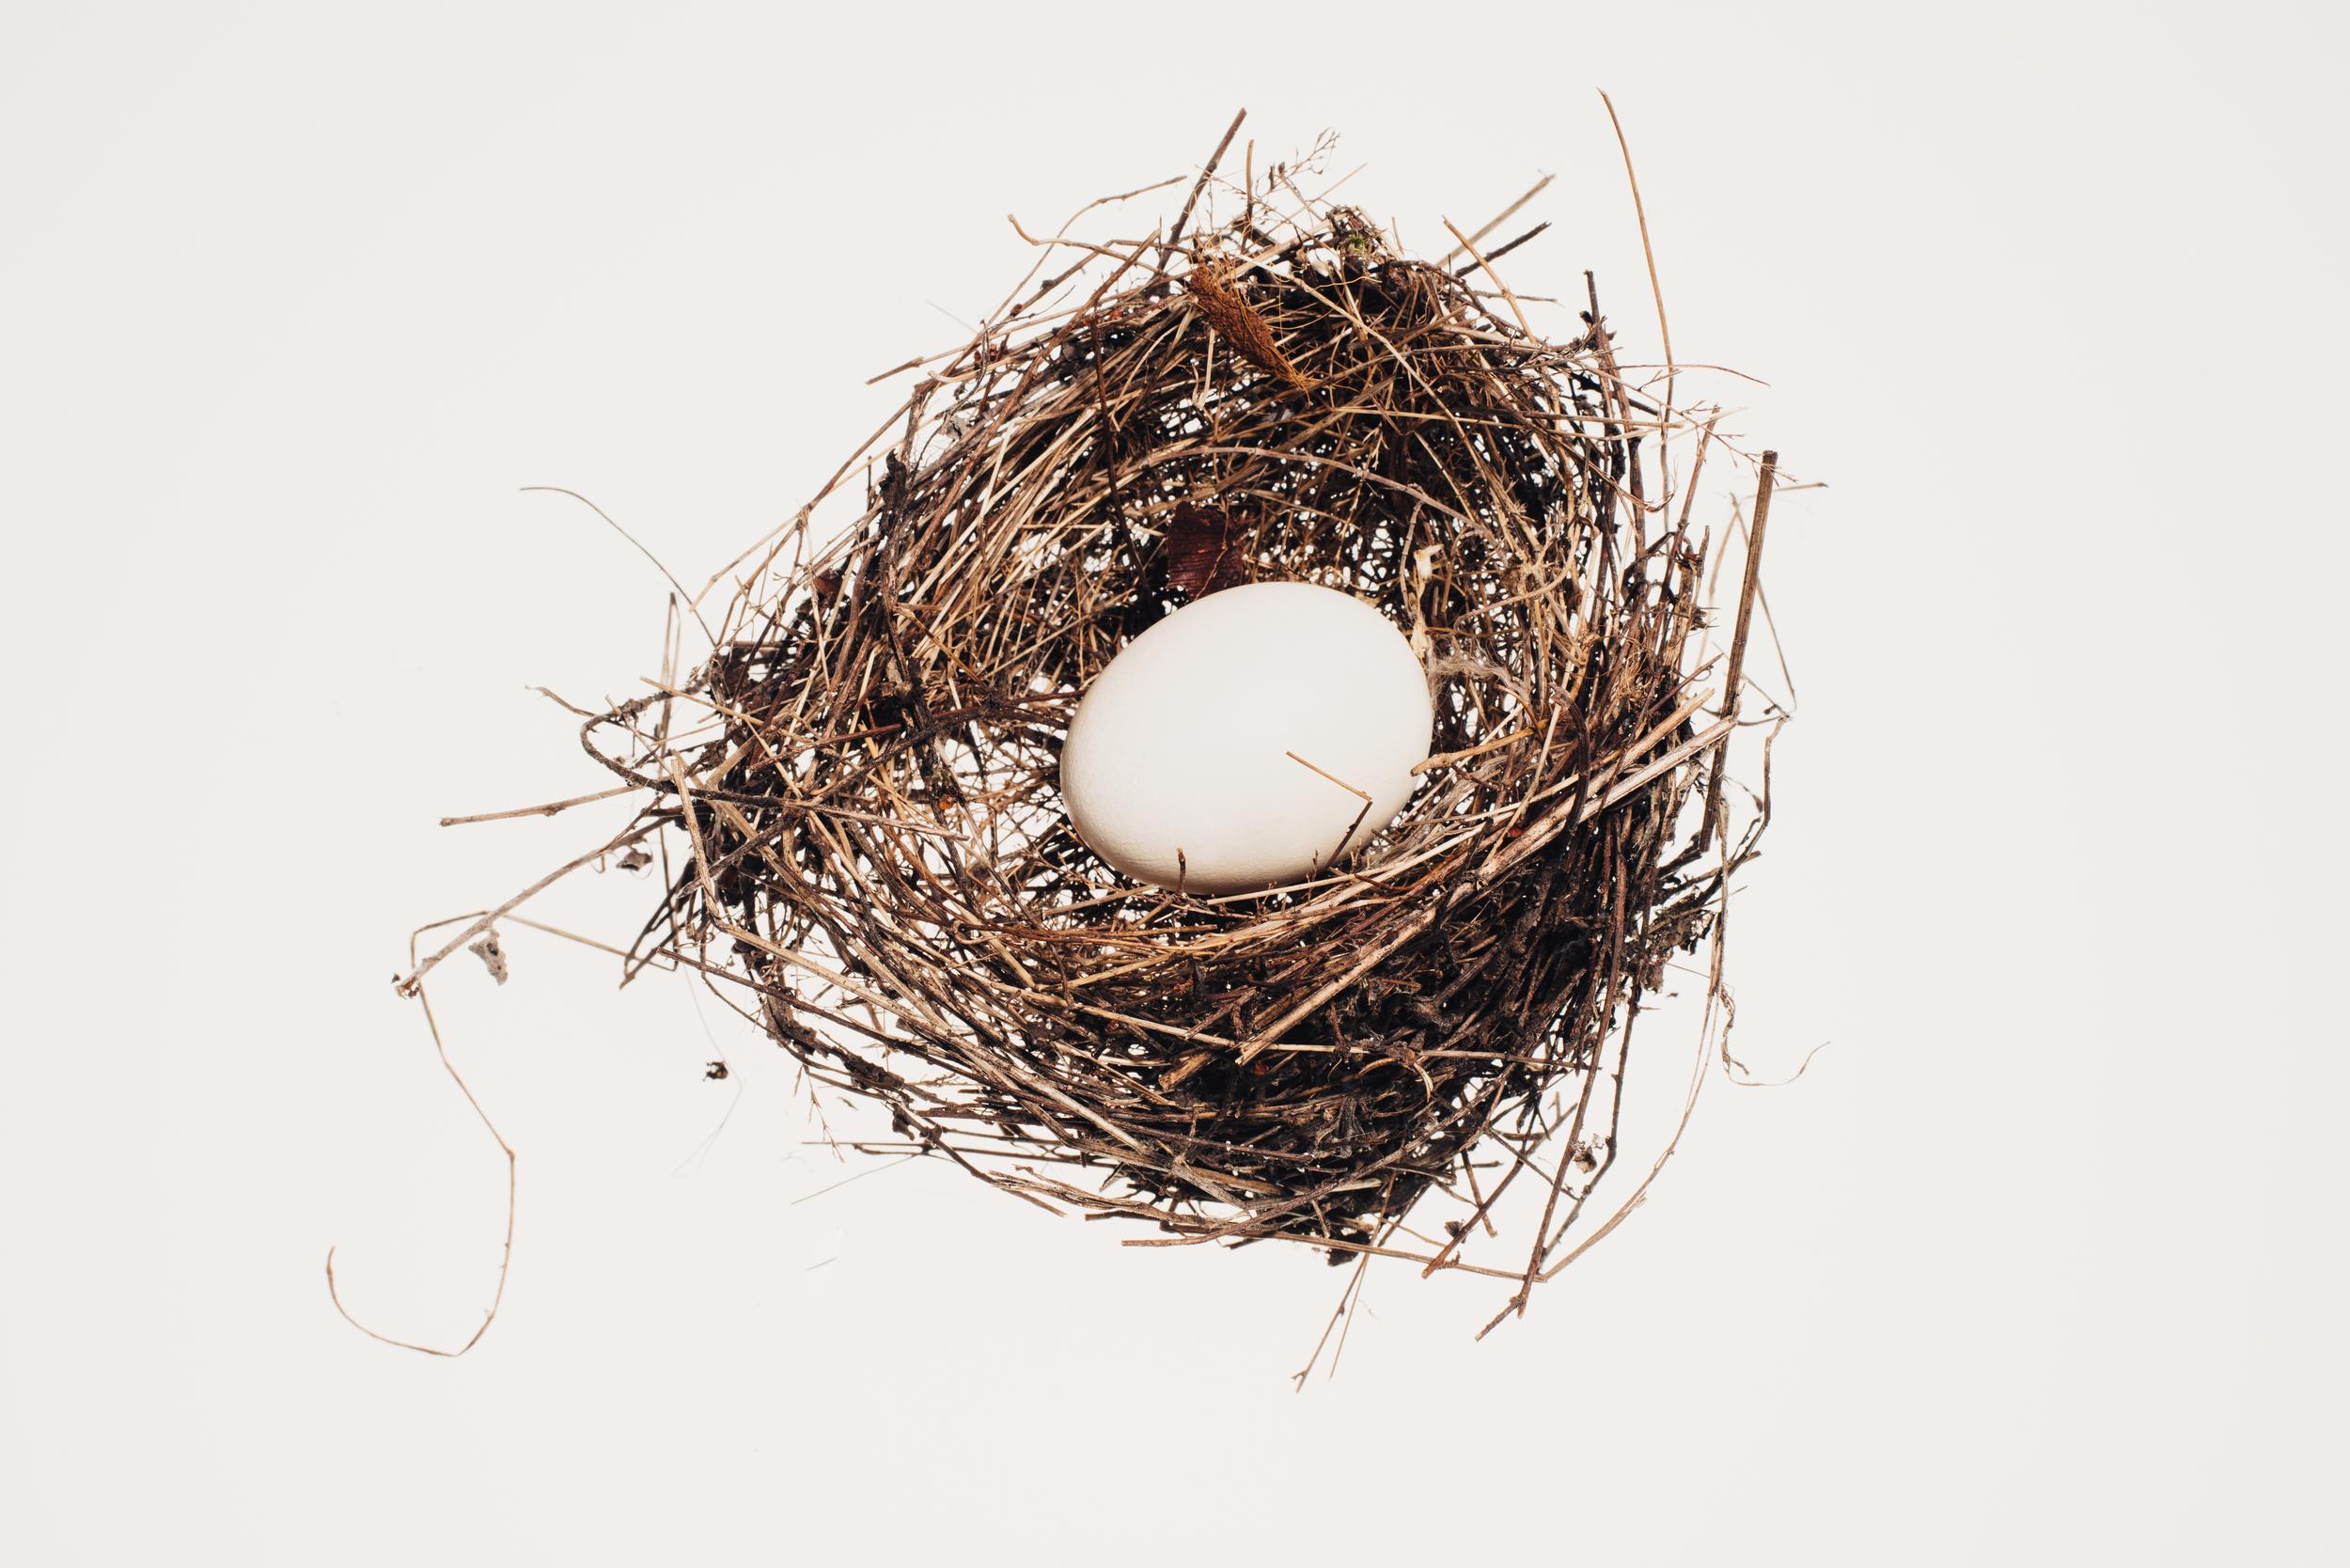 Bird_Nests-0017-2.jpg